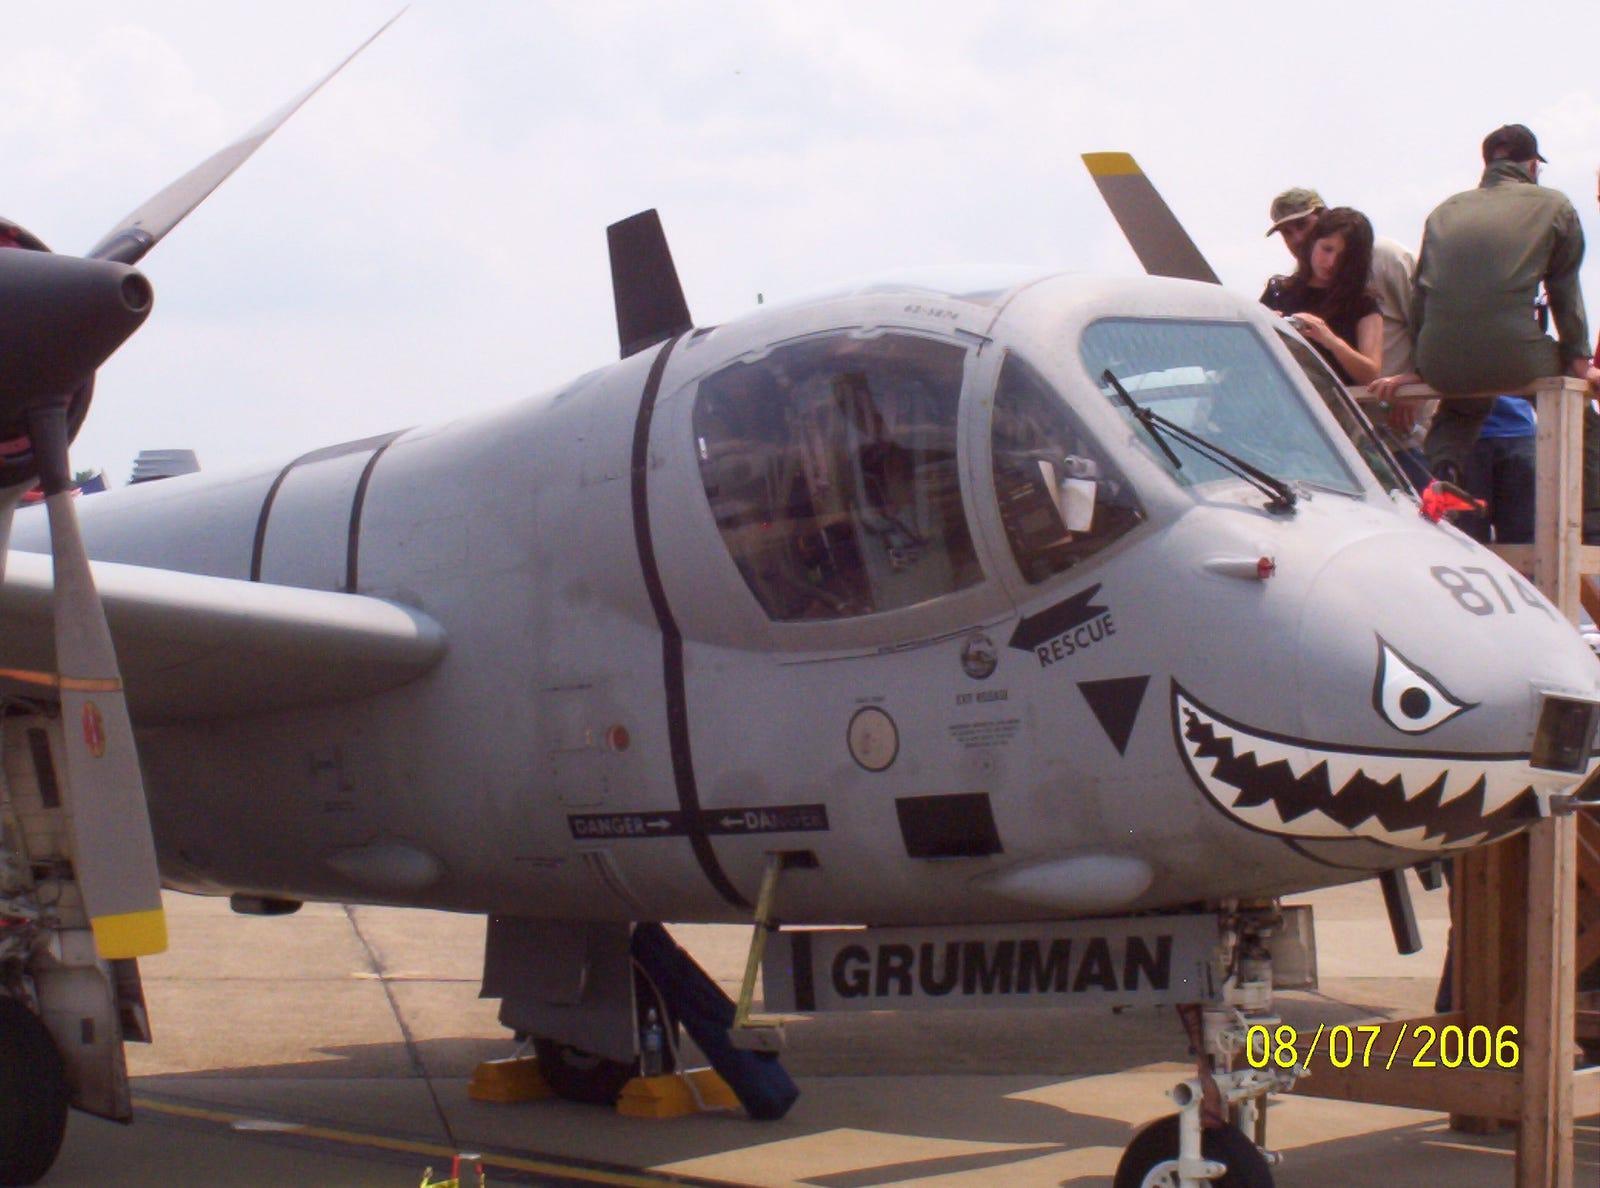 Grumman OV-1D, back for another visit.